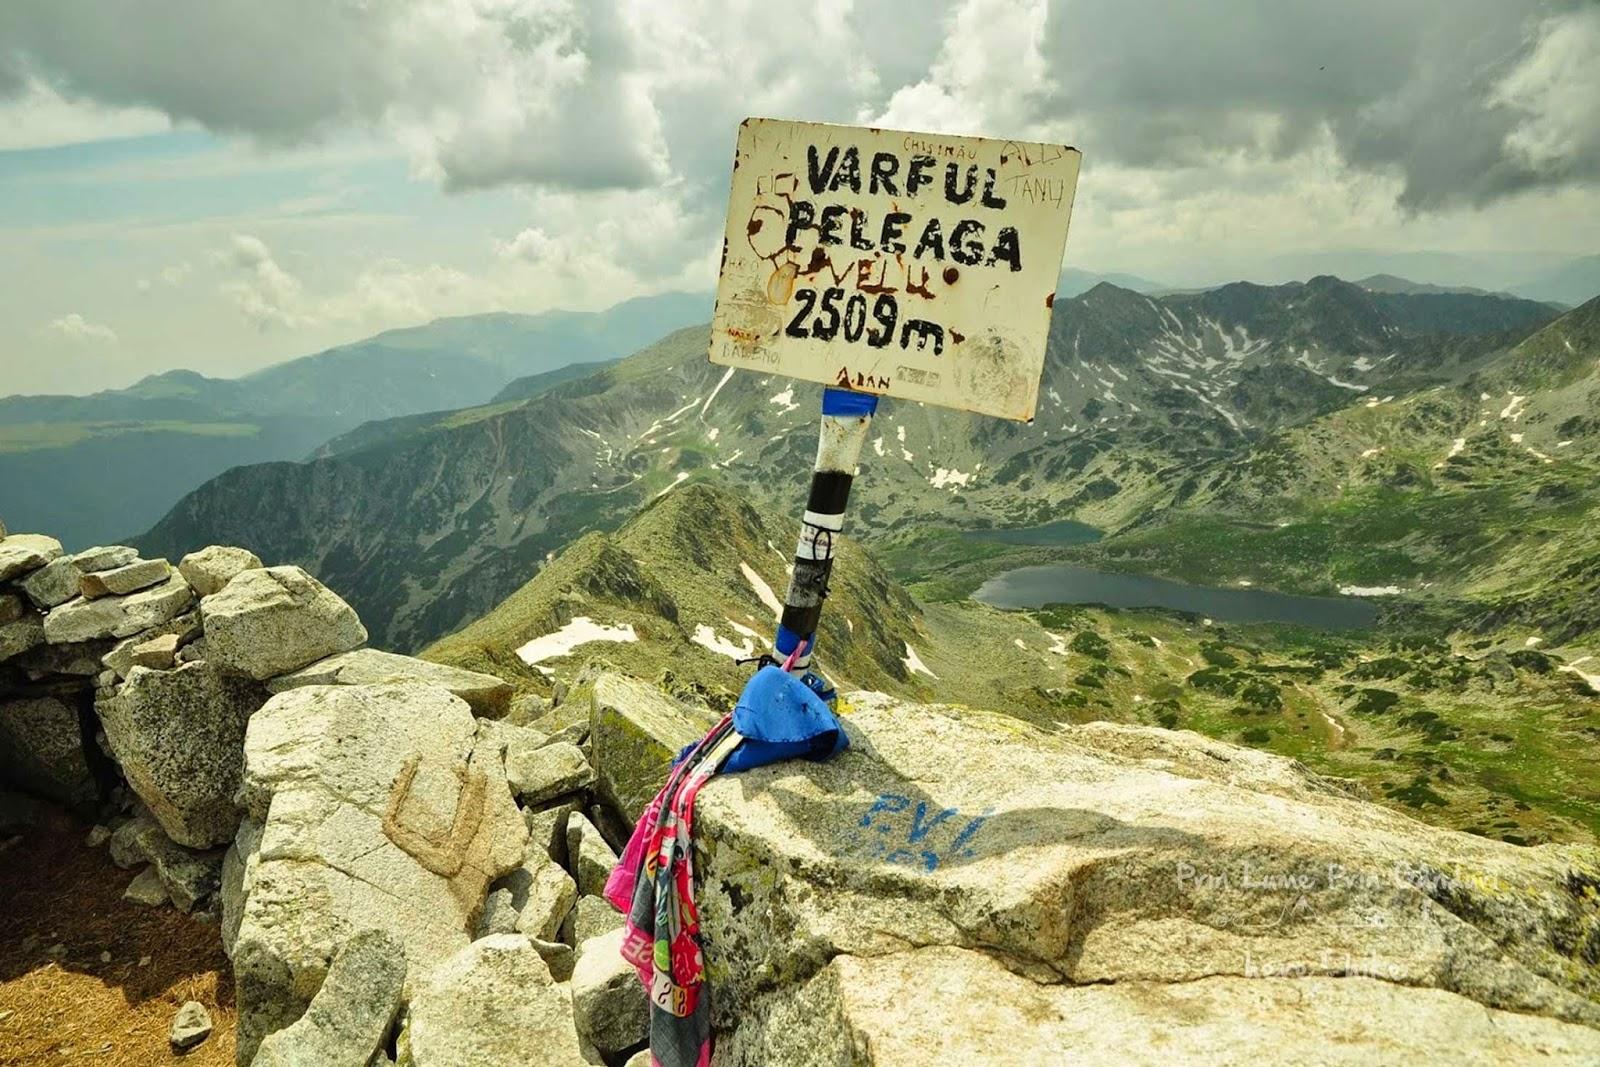 Peleaga_Peak_peleaga_peak